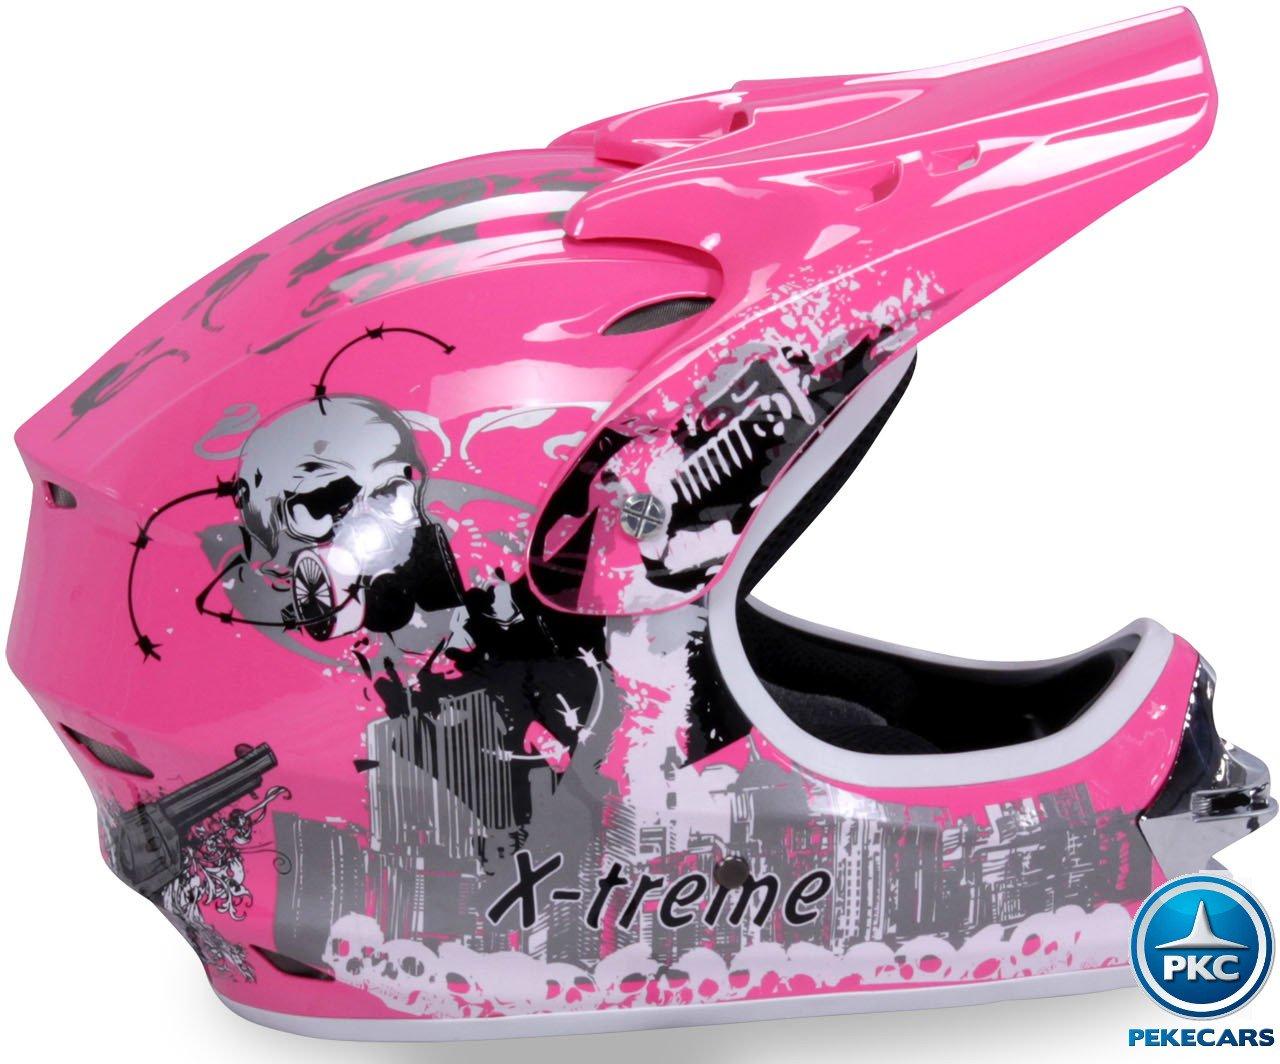 Casco Cross Helm Rosa Pekecars